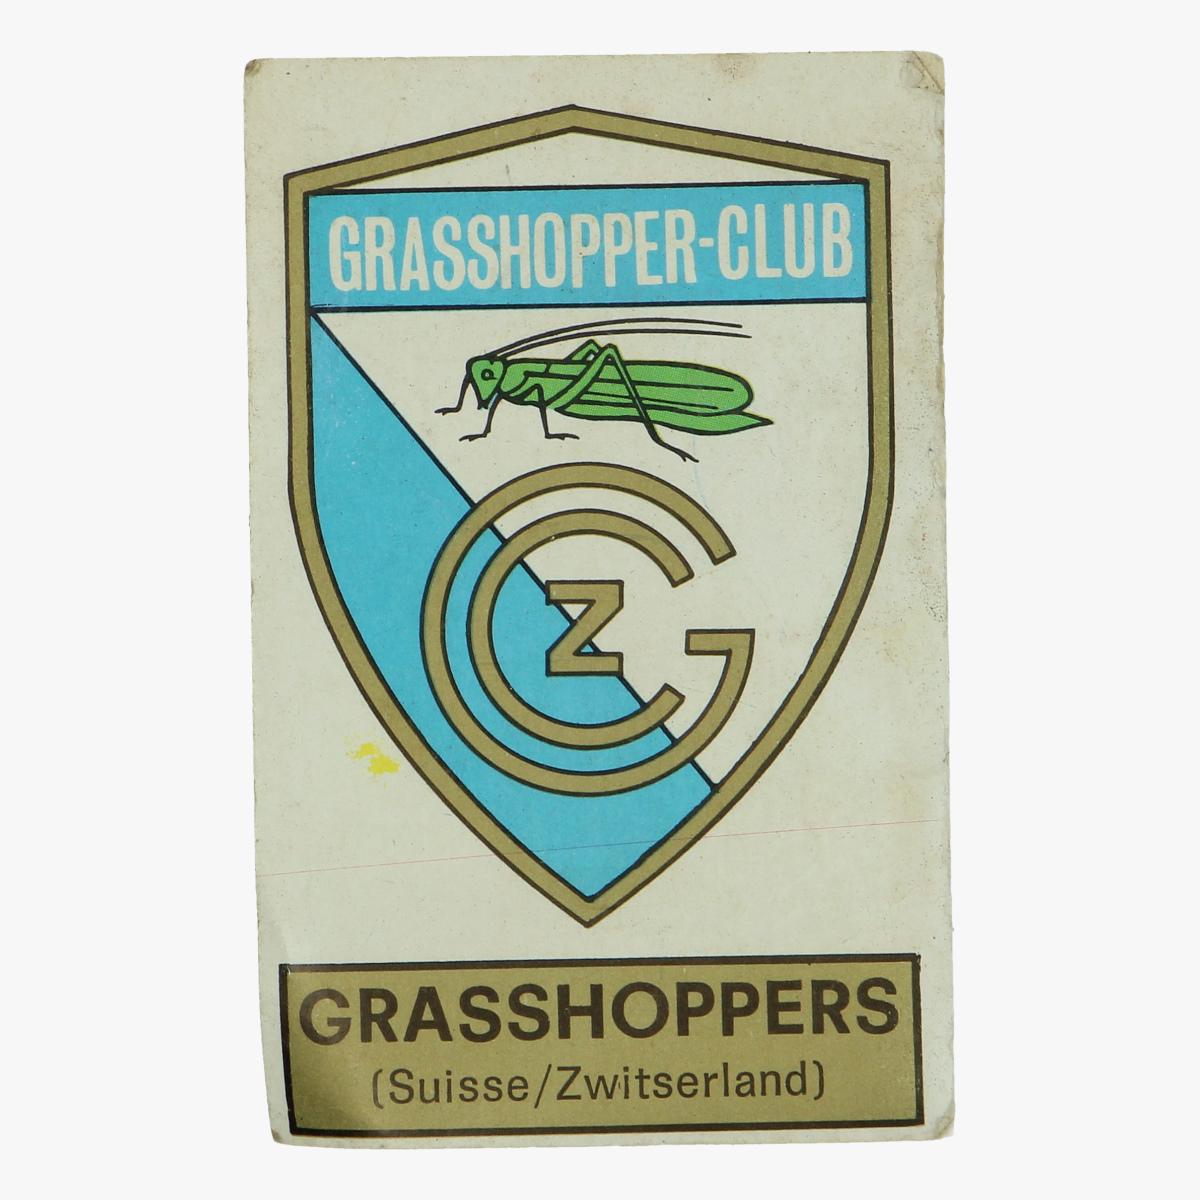 Afbeeldingen van grasshopper-club zwitserland panini foosball 1972/73